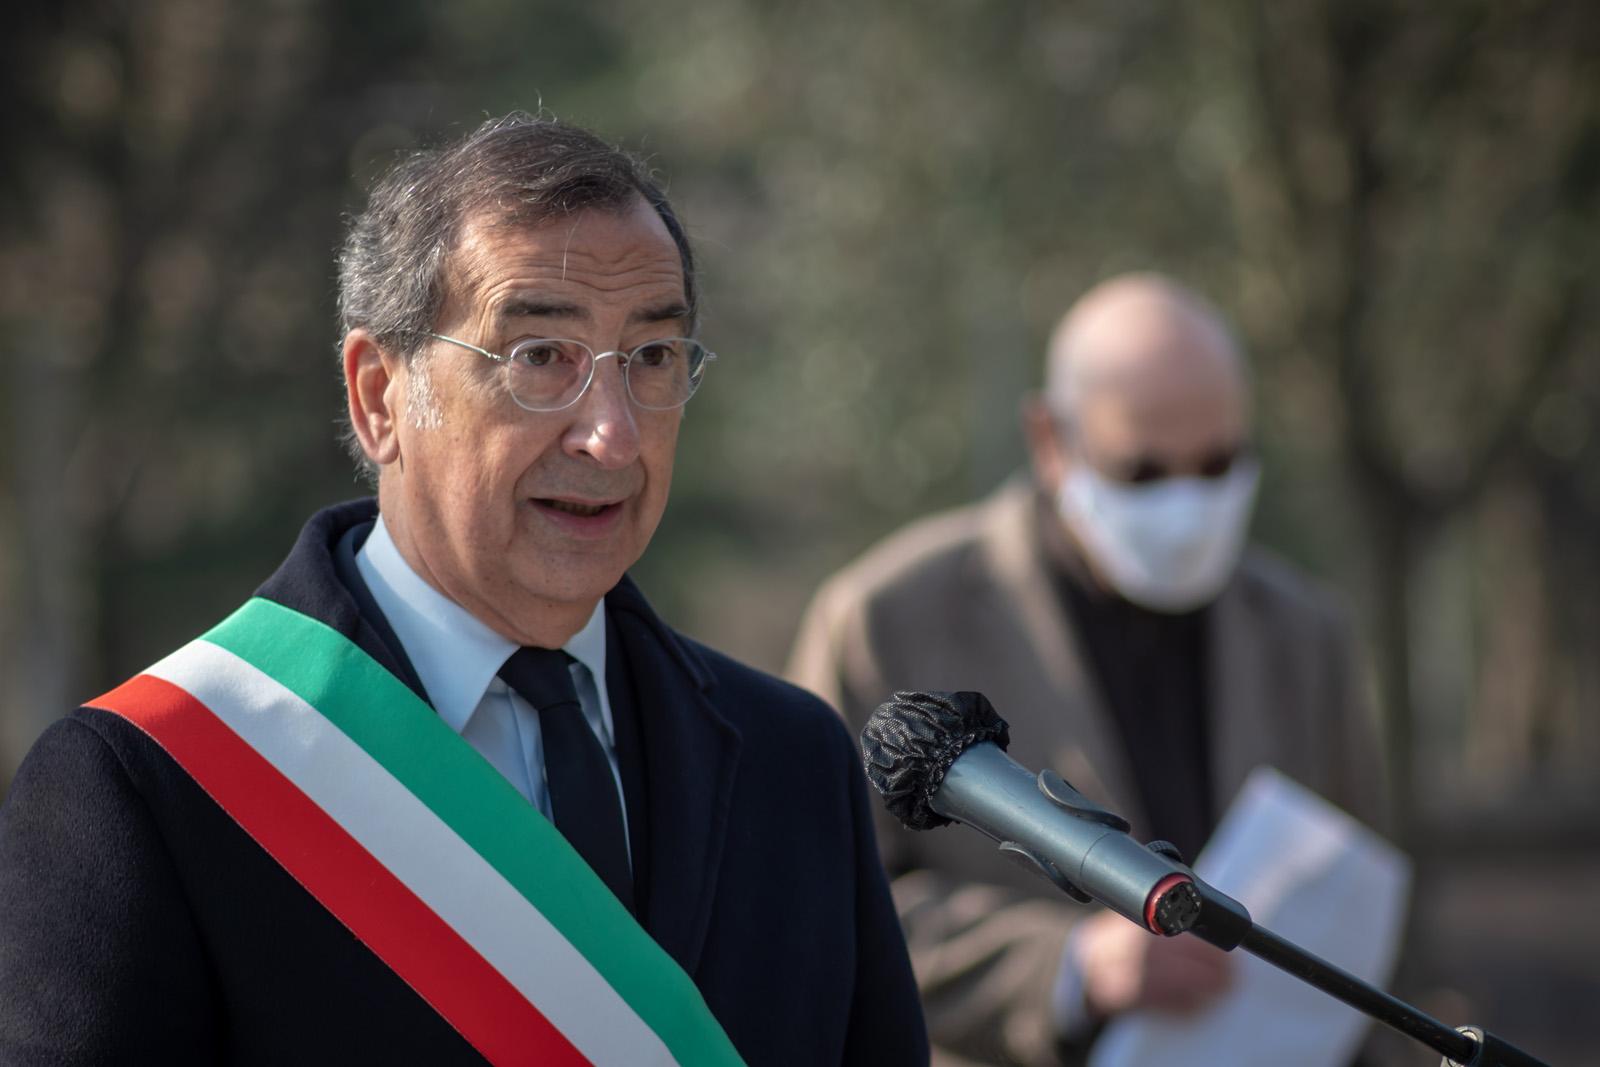 The intervention of the Mayor Giuseppe Sala